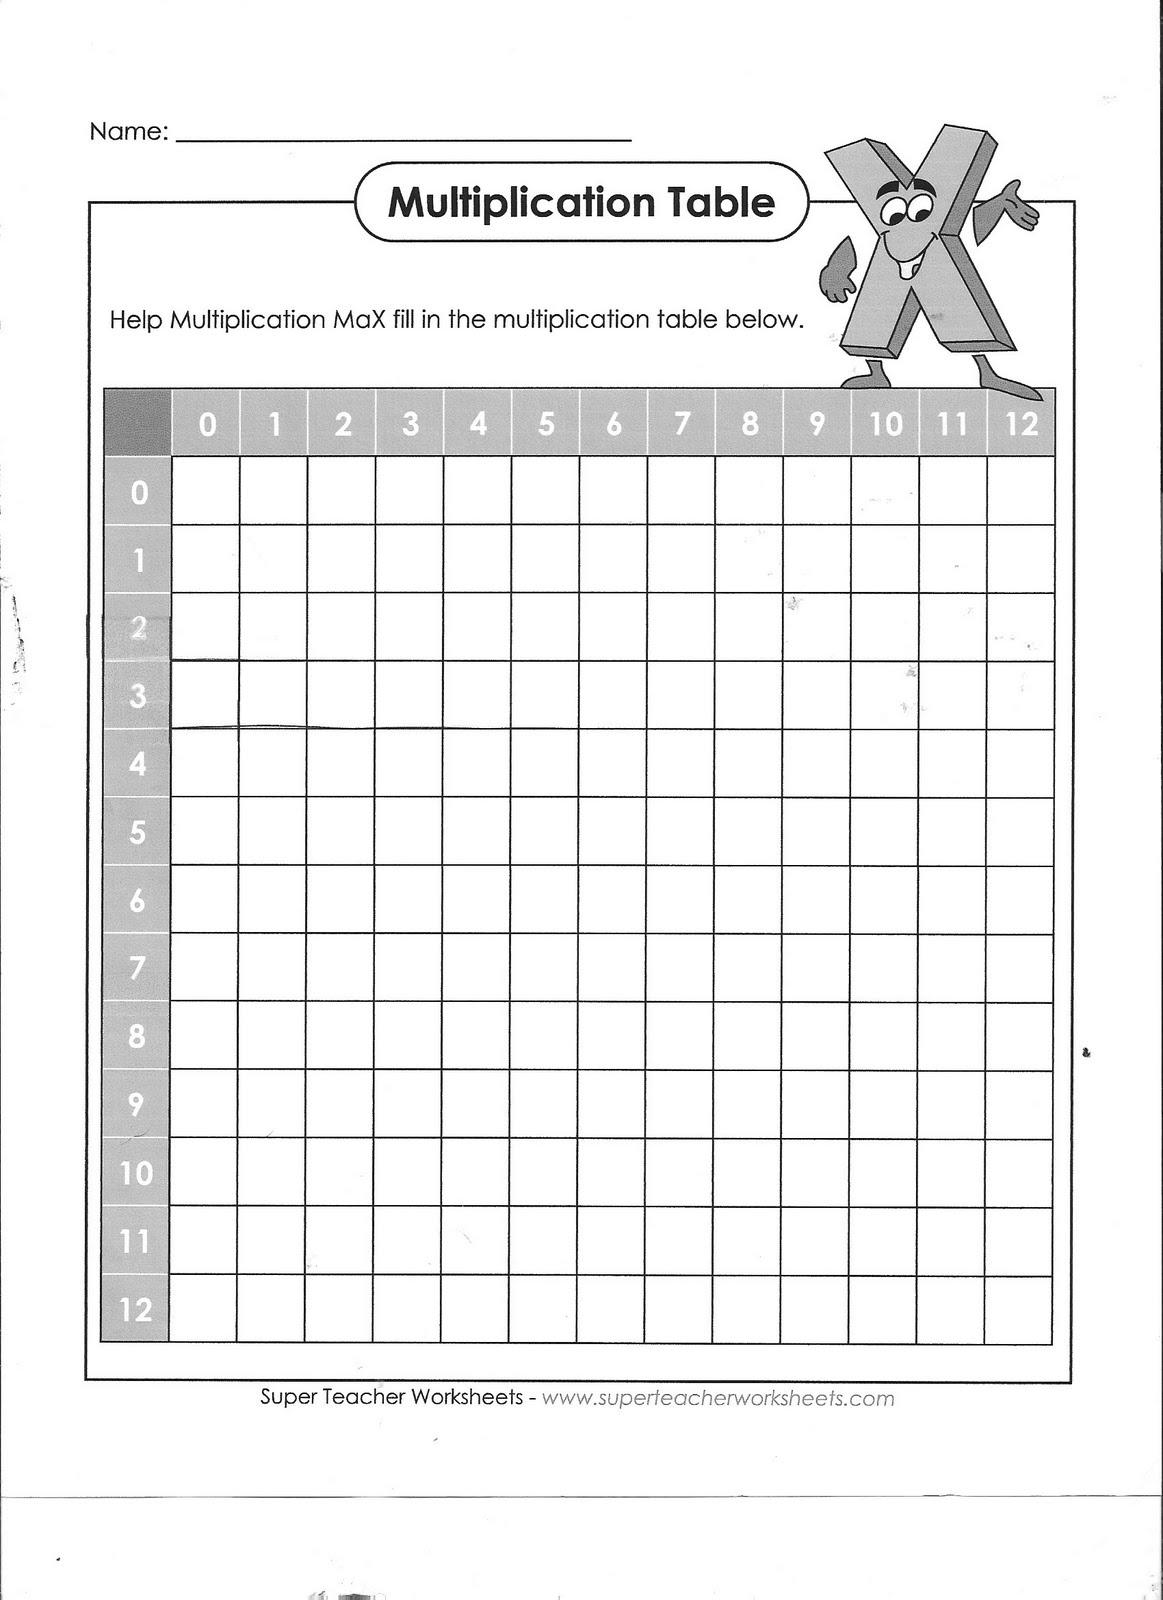 worksheet Blank Multiplication Table Duliziyou Worksheets for – Multiplication Grids Worksheets